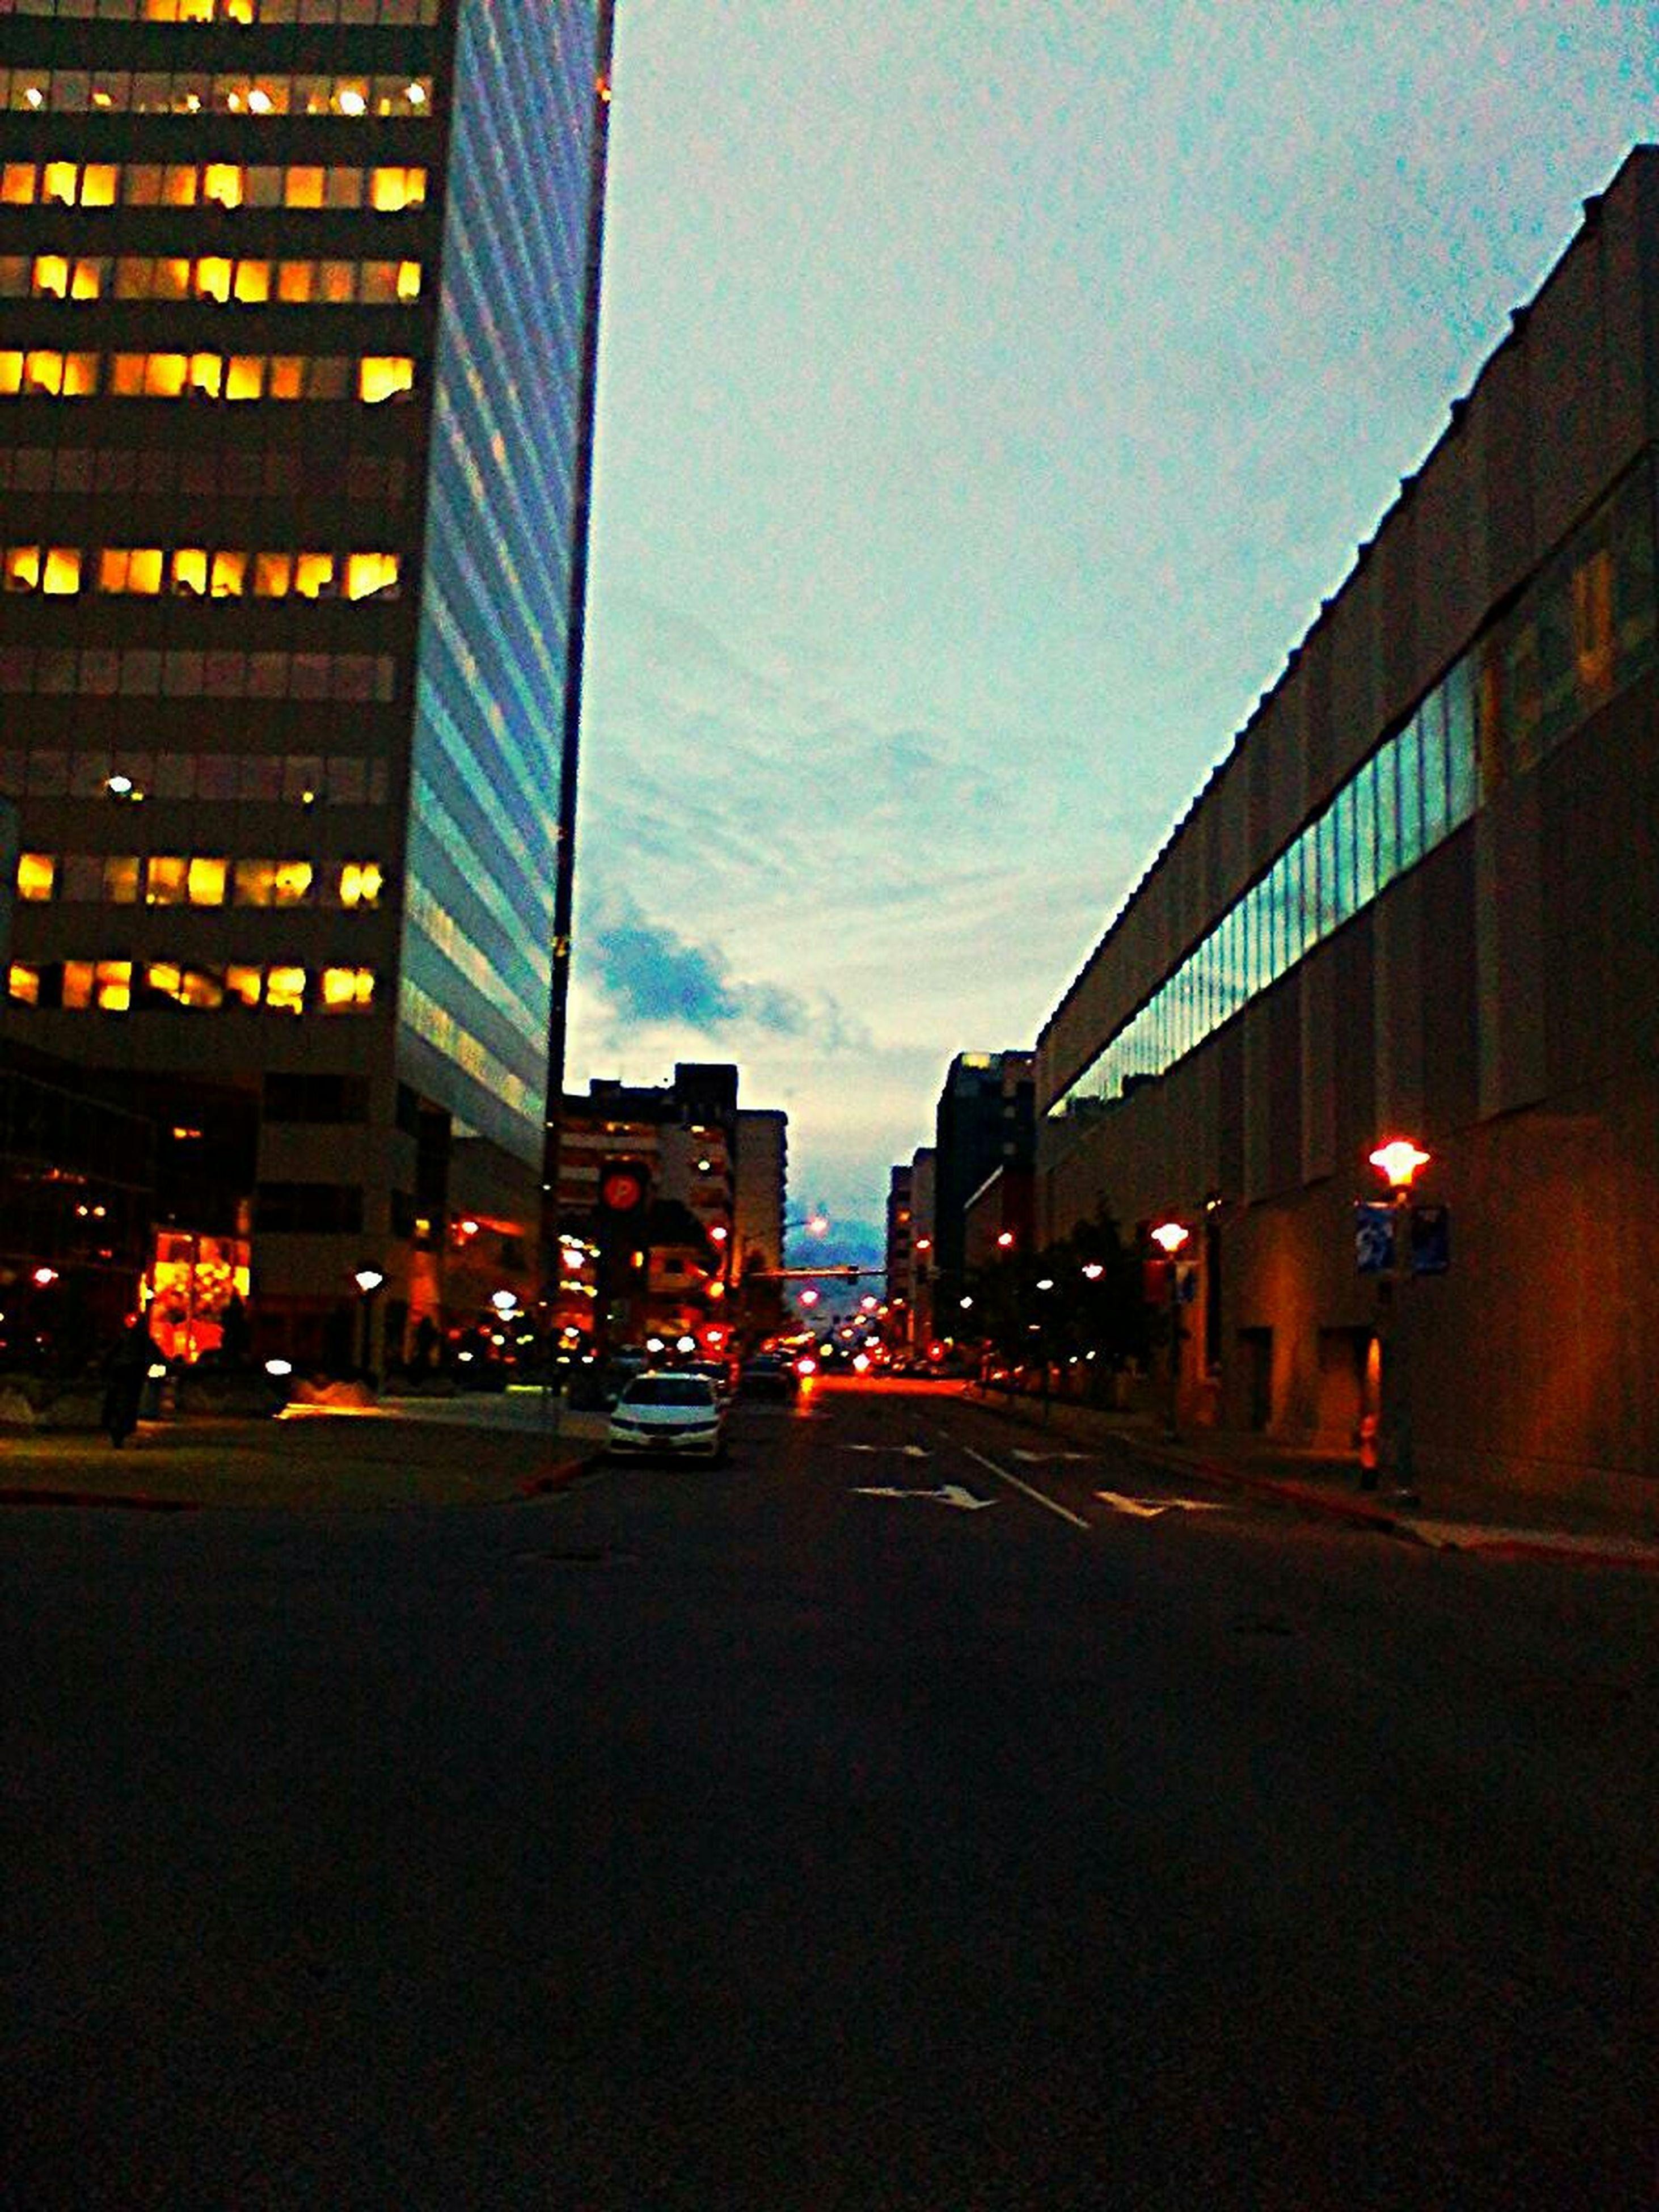 building exterior, architecture, illuminated, built structure, city, transportation, night, street, car, land vehicle, city street, city life, road, building, mode of transport, street light, traffic, sky, dusk, outdoors